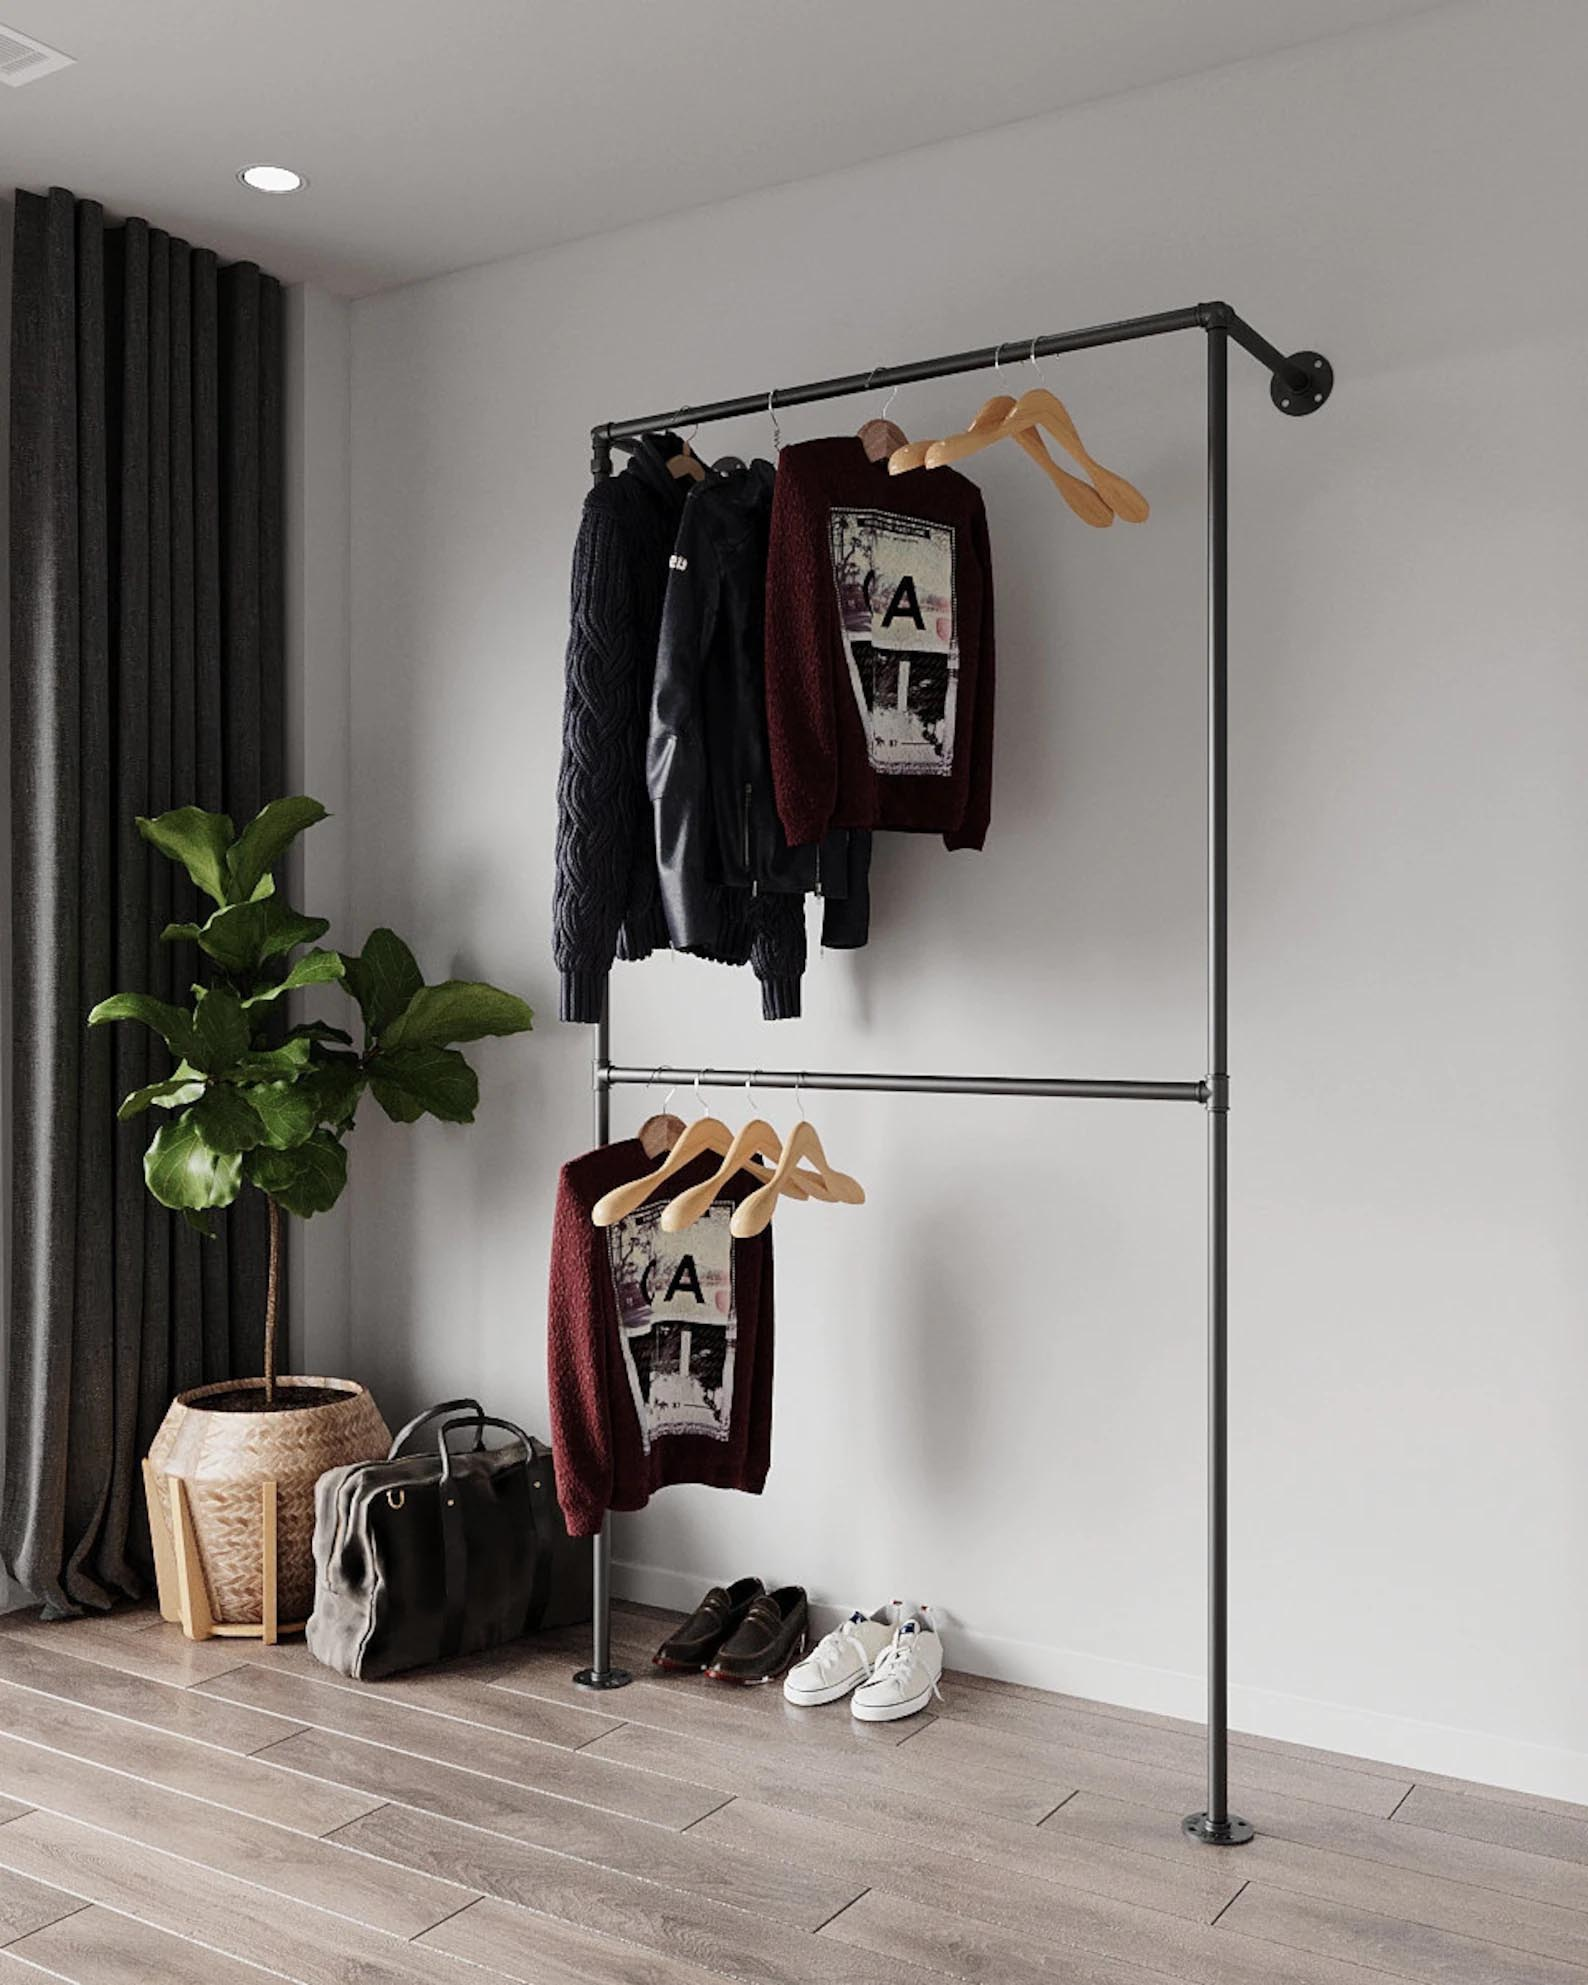 Storage Idea - Modern wall mounted black metal clothes rack.